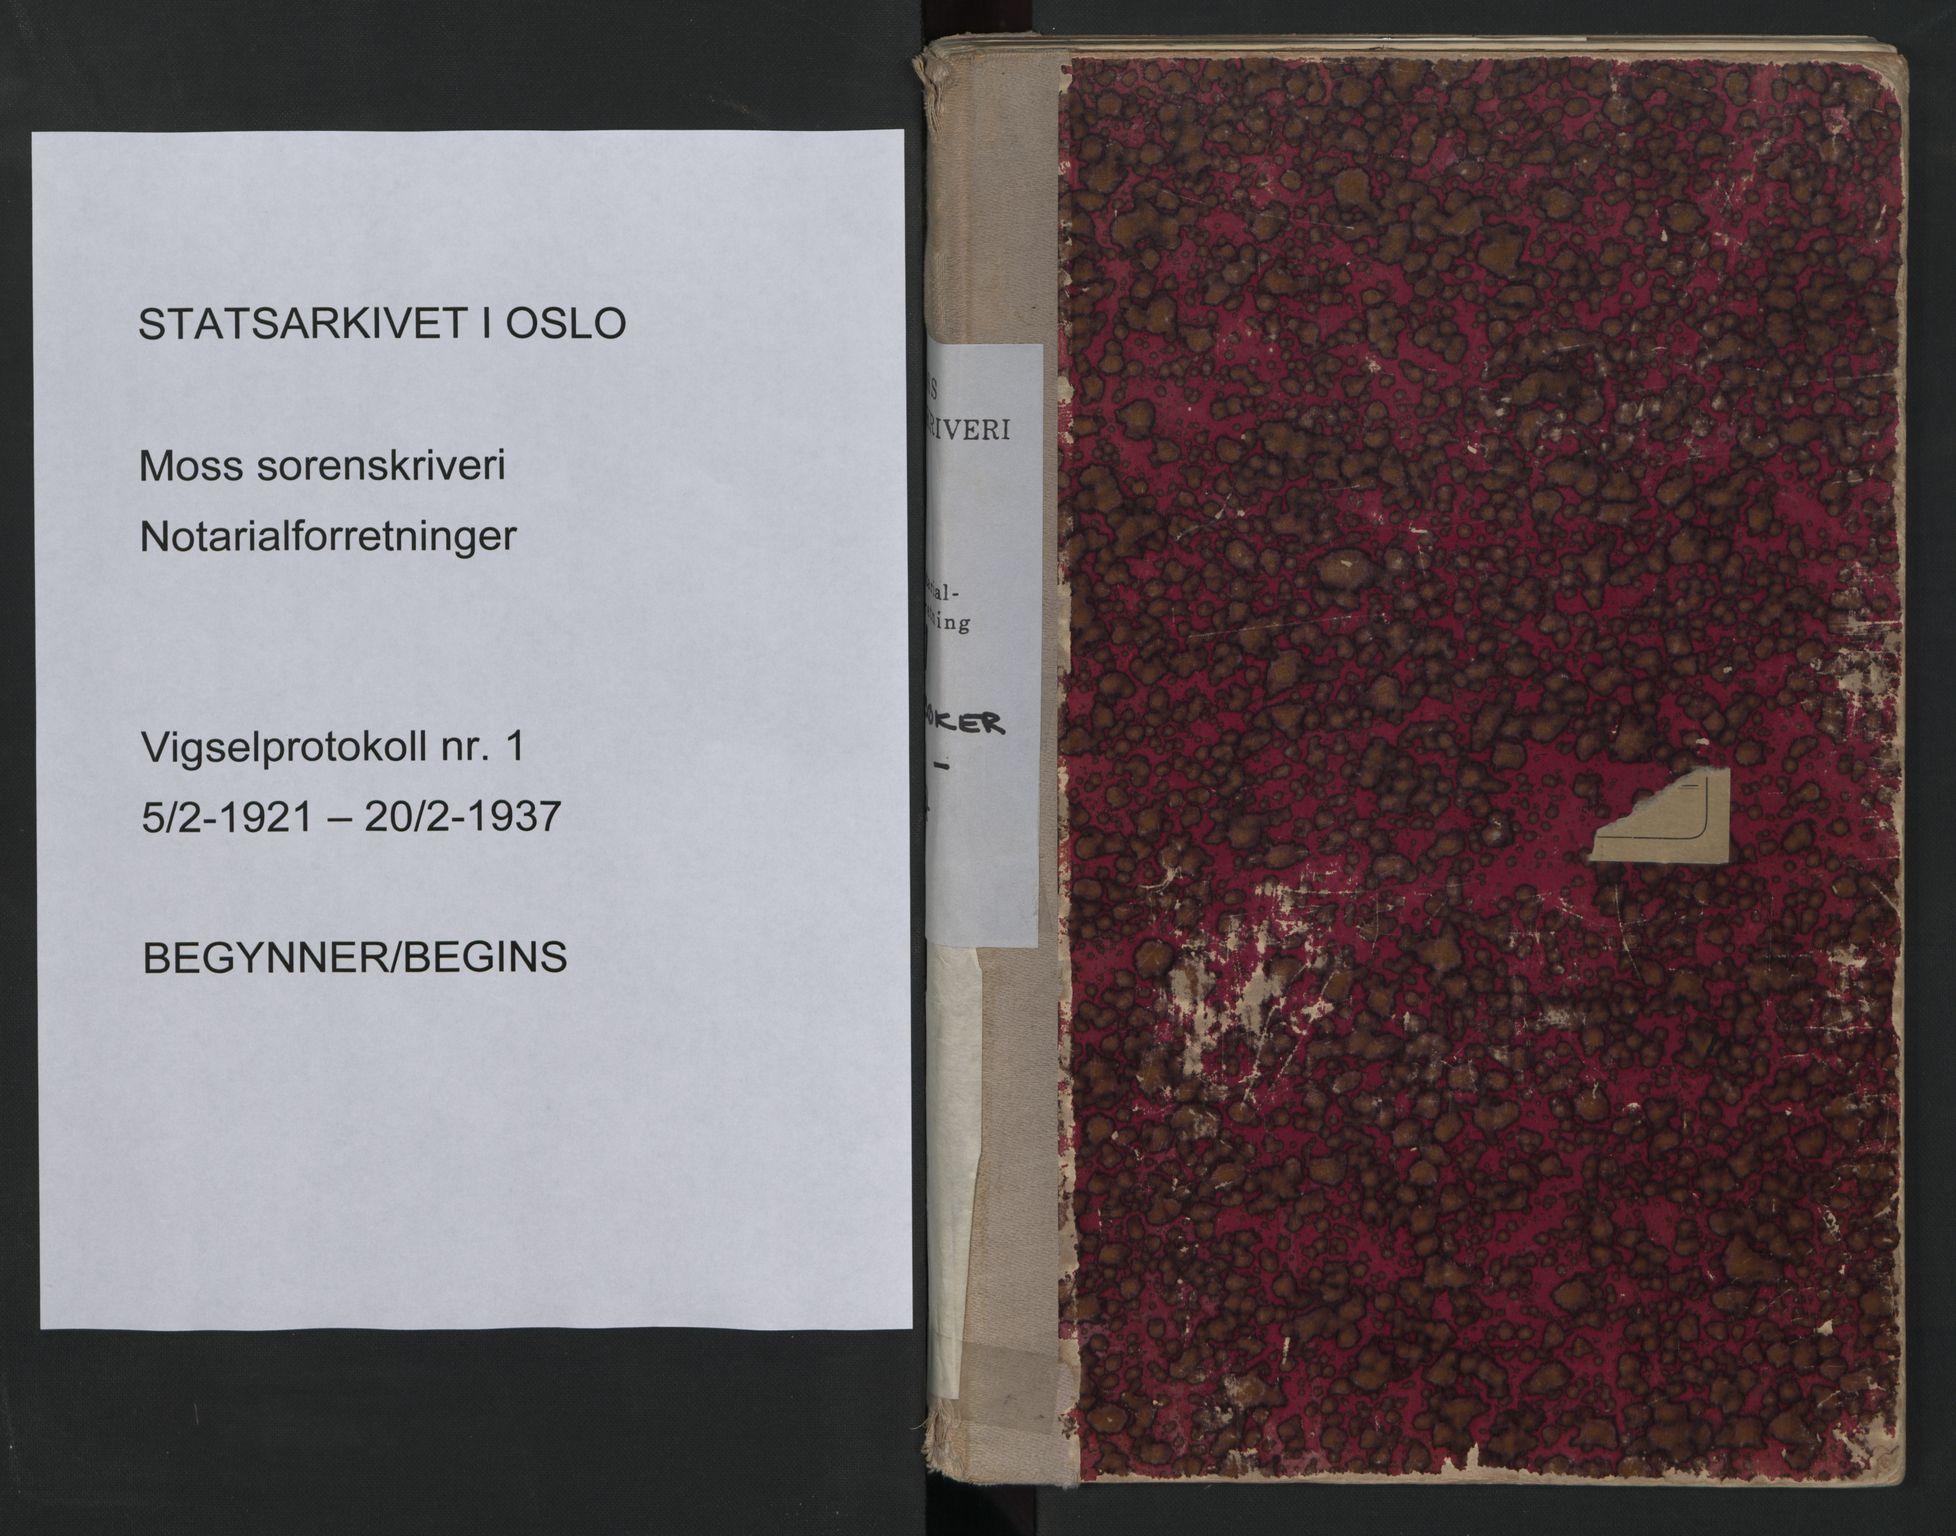 SAO, Moss sorenskriveri, 1921-1937, s. upaginert